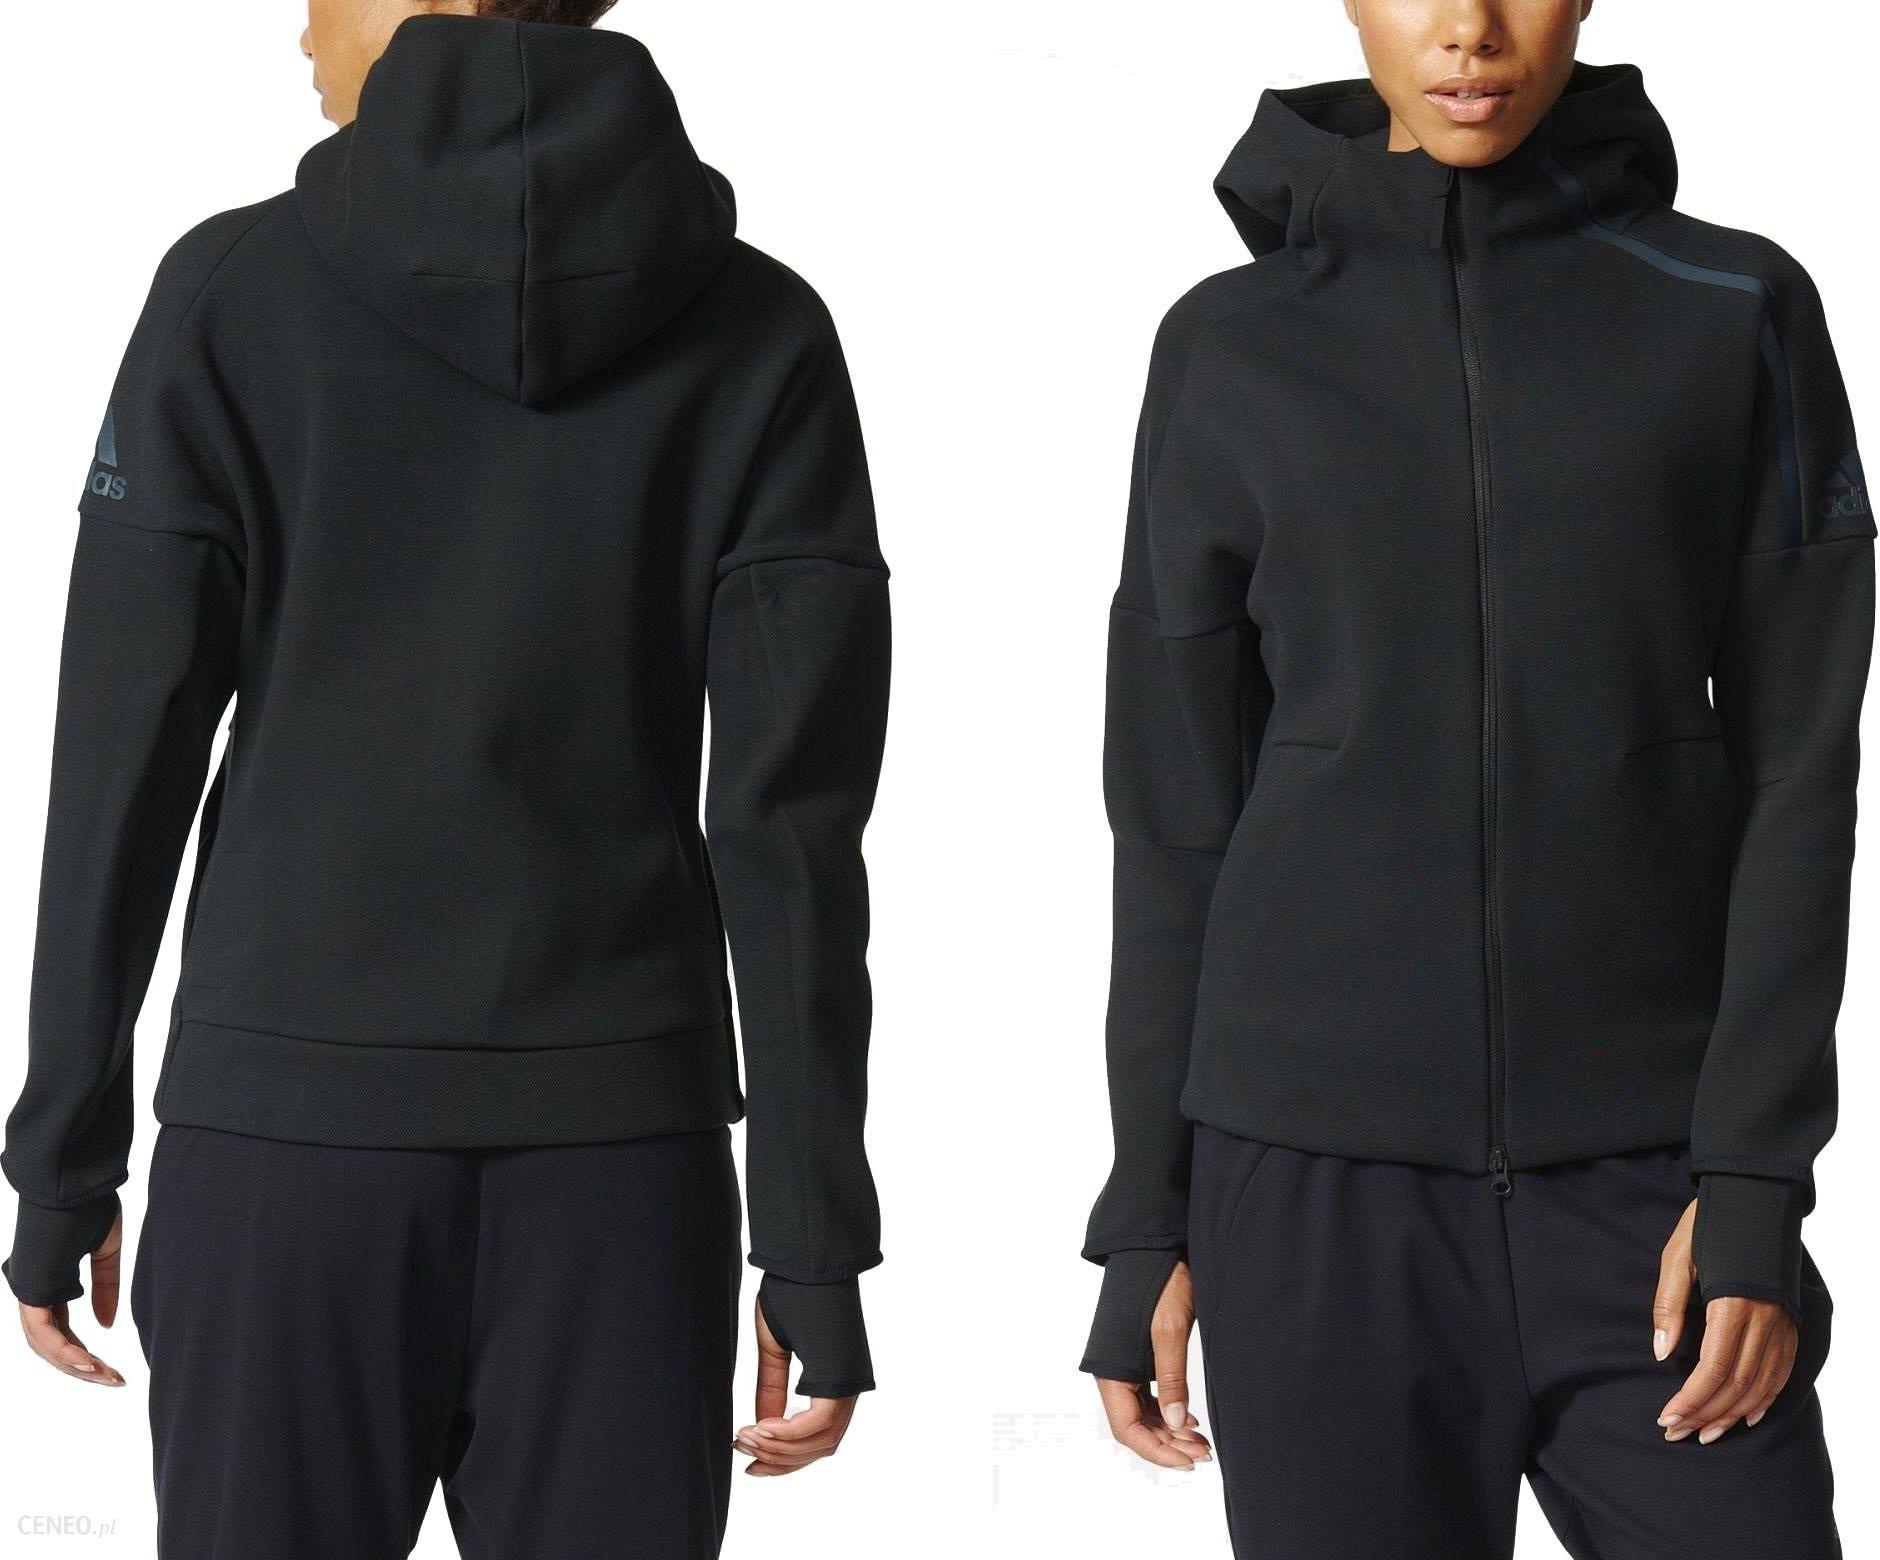 Adidas Z.n.e Hoody (40L) Bluza Damska